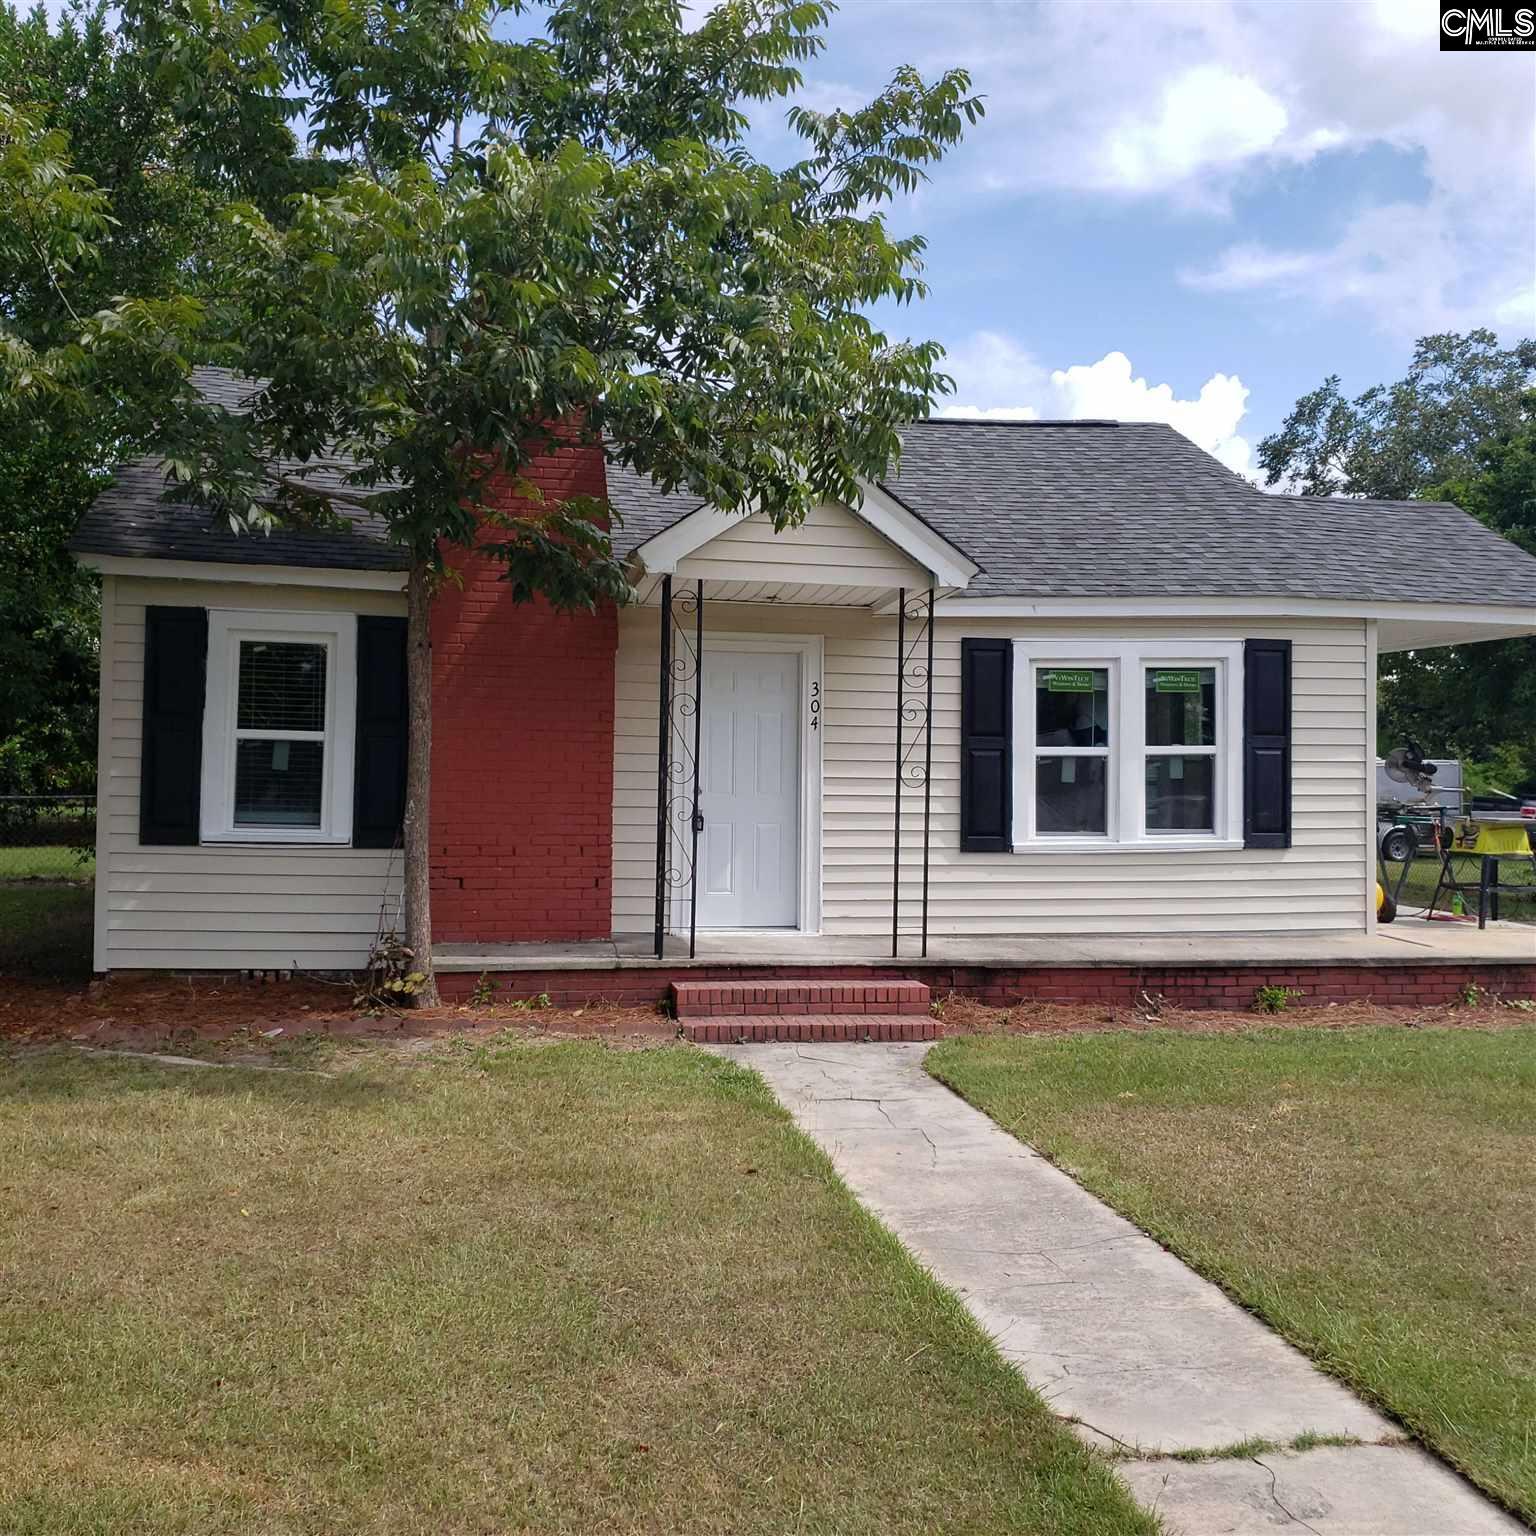 304 S Pine Batesburg, SC 29006